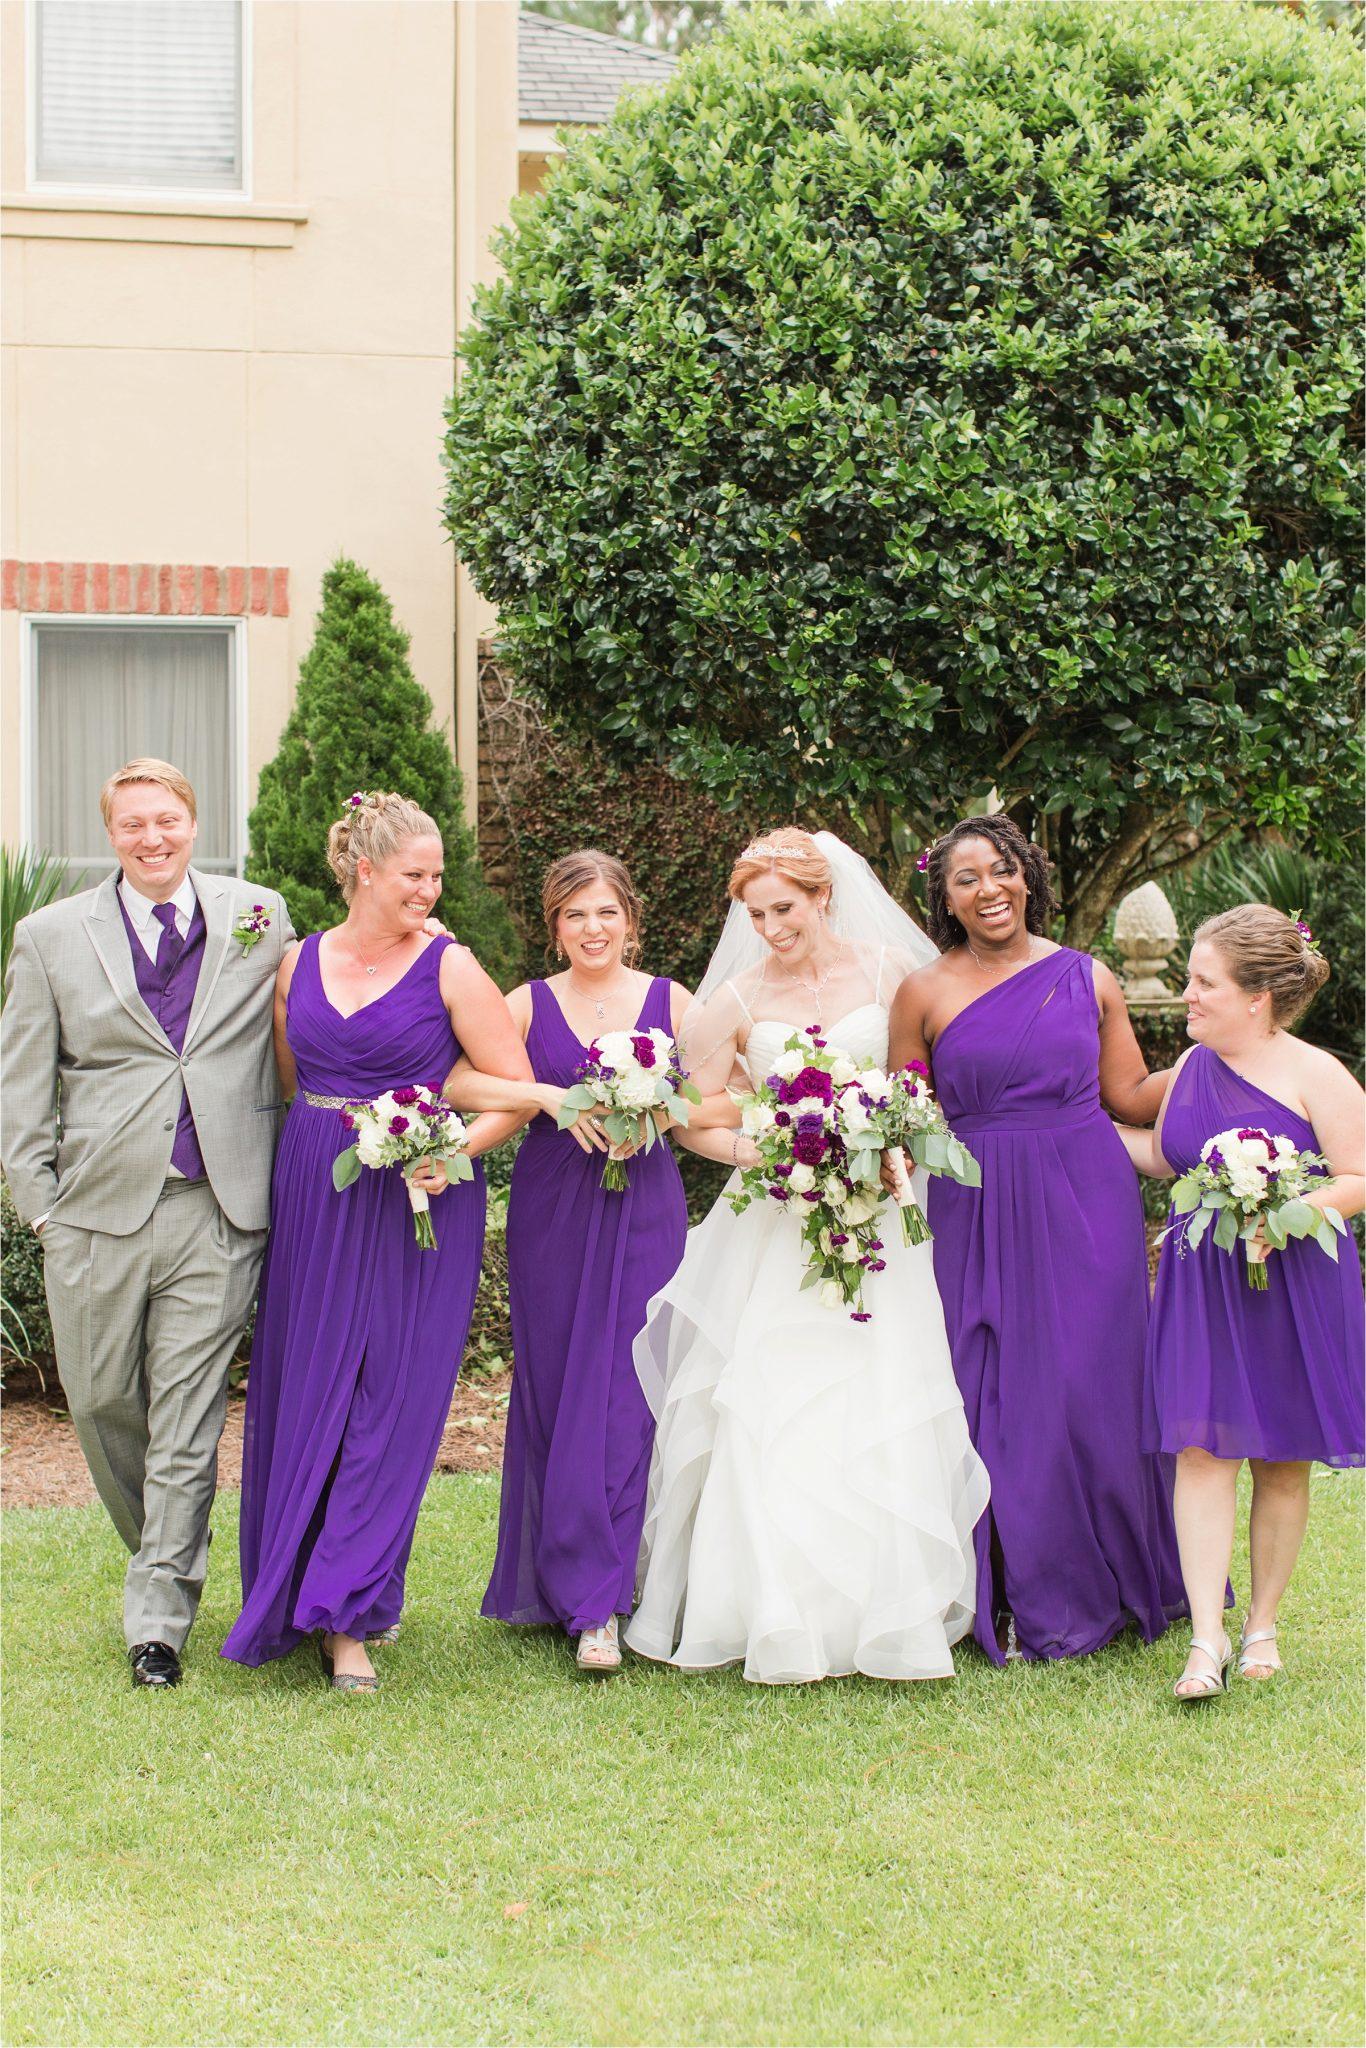 Romantic Destination Wedding Photographer-Bella Sera Gardens-Sarra + Matt-Bridal photography-Wedding party-Purple themed wedding